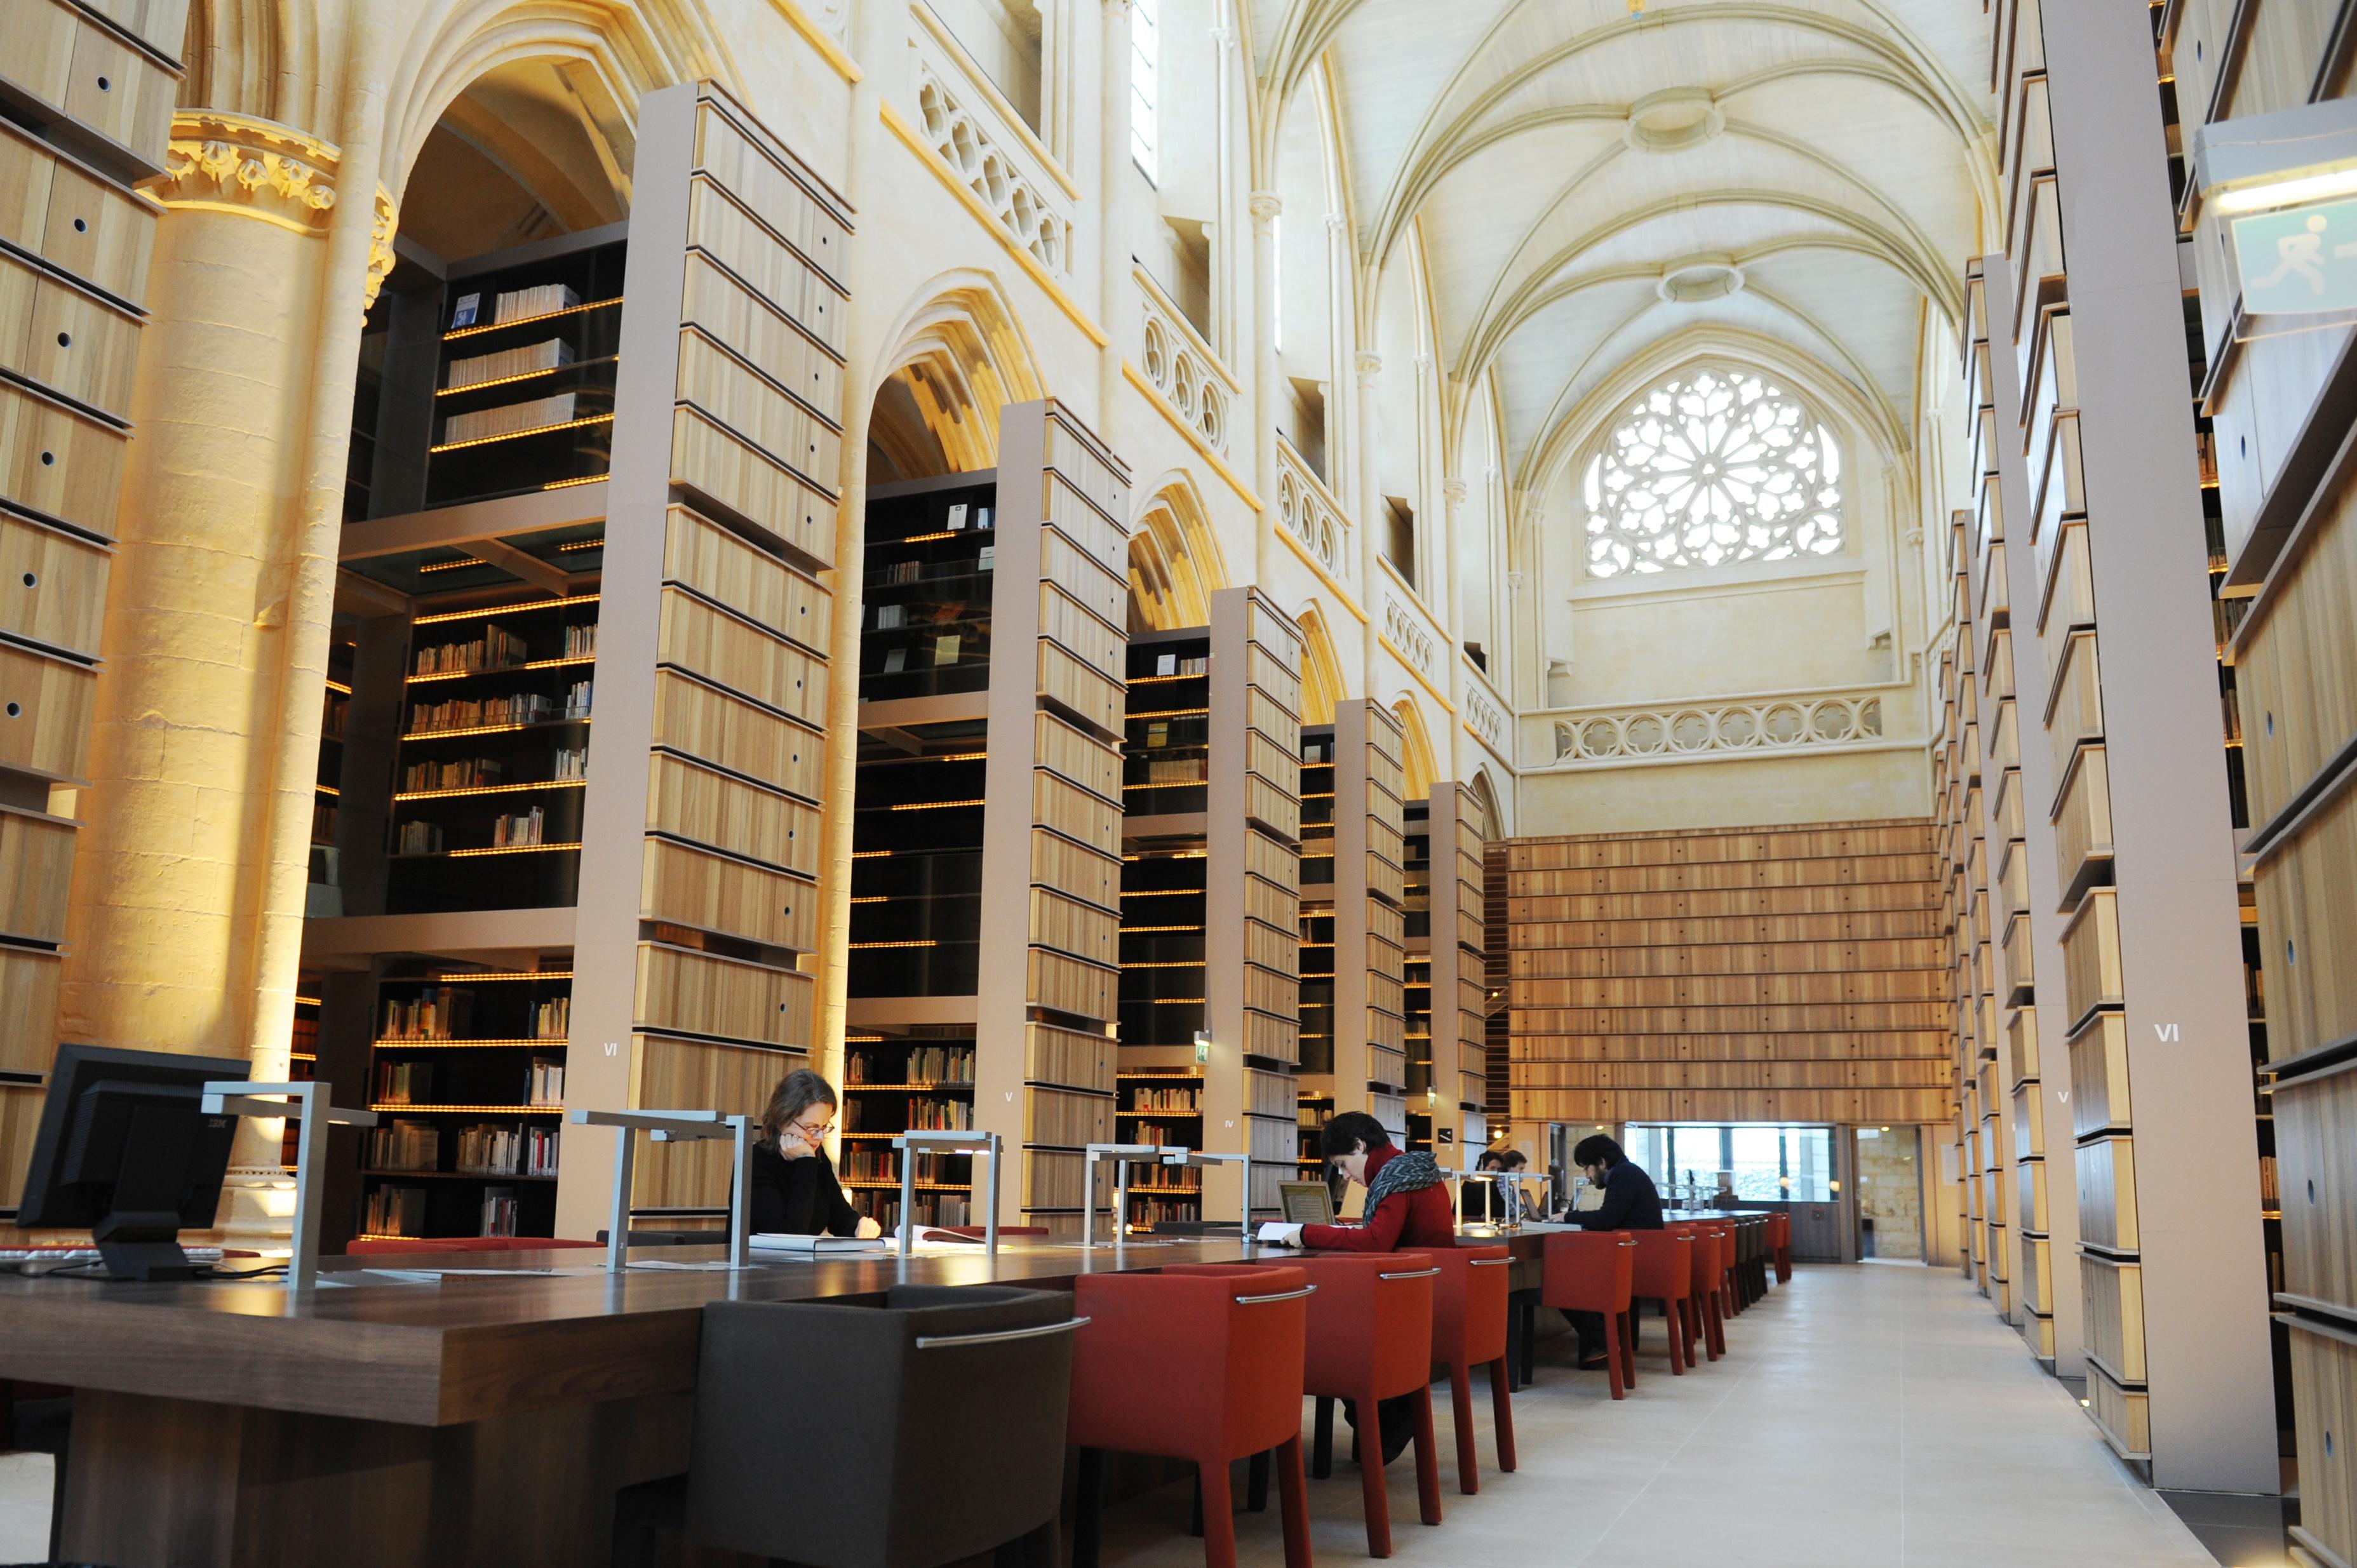 Bibliothèque de l'IMEC Abbaye d'Ardenne